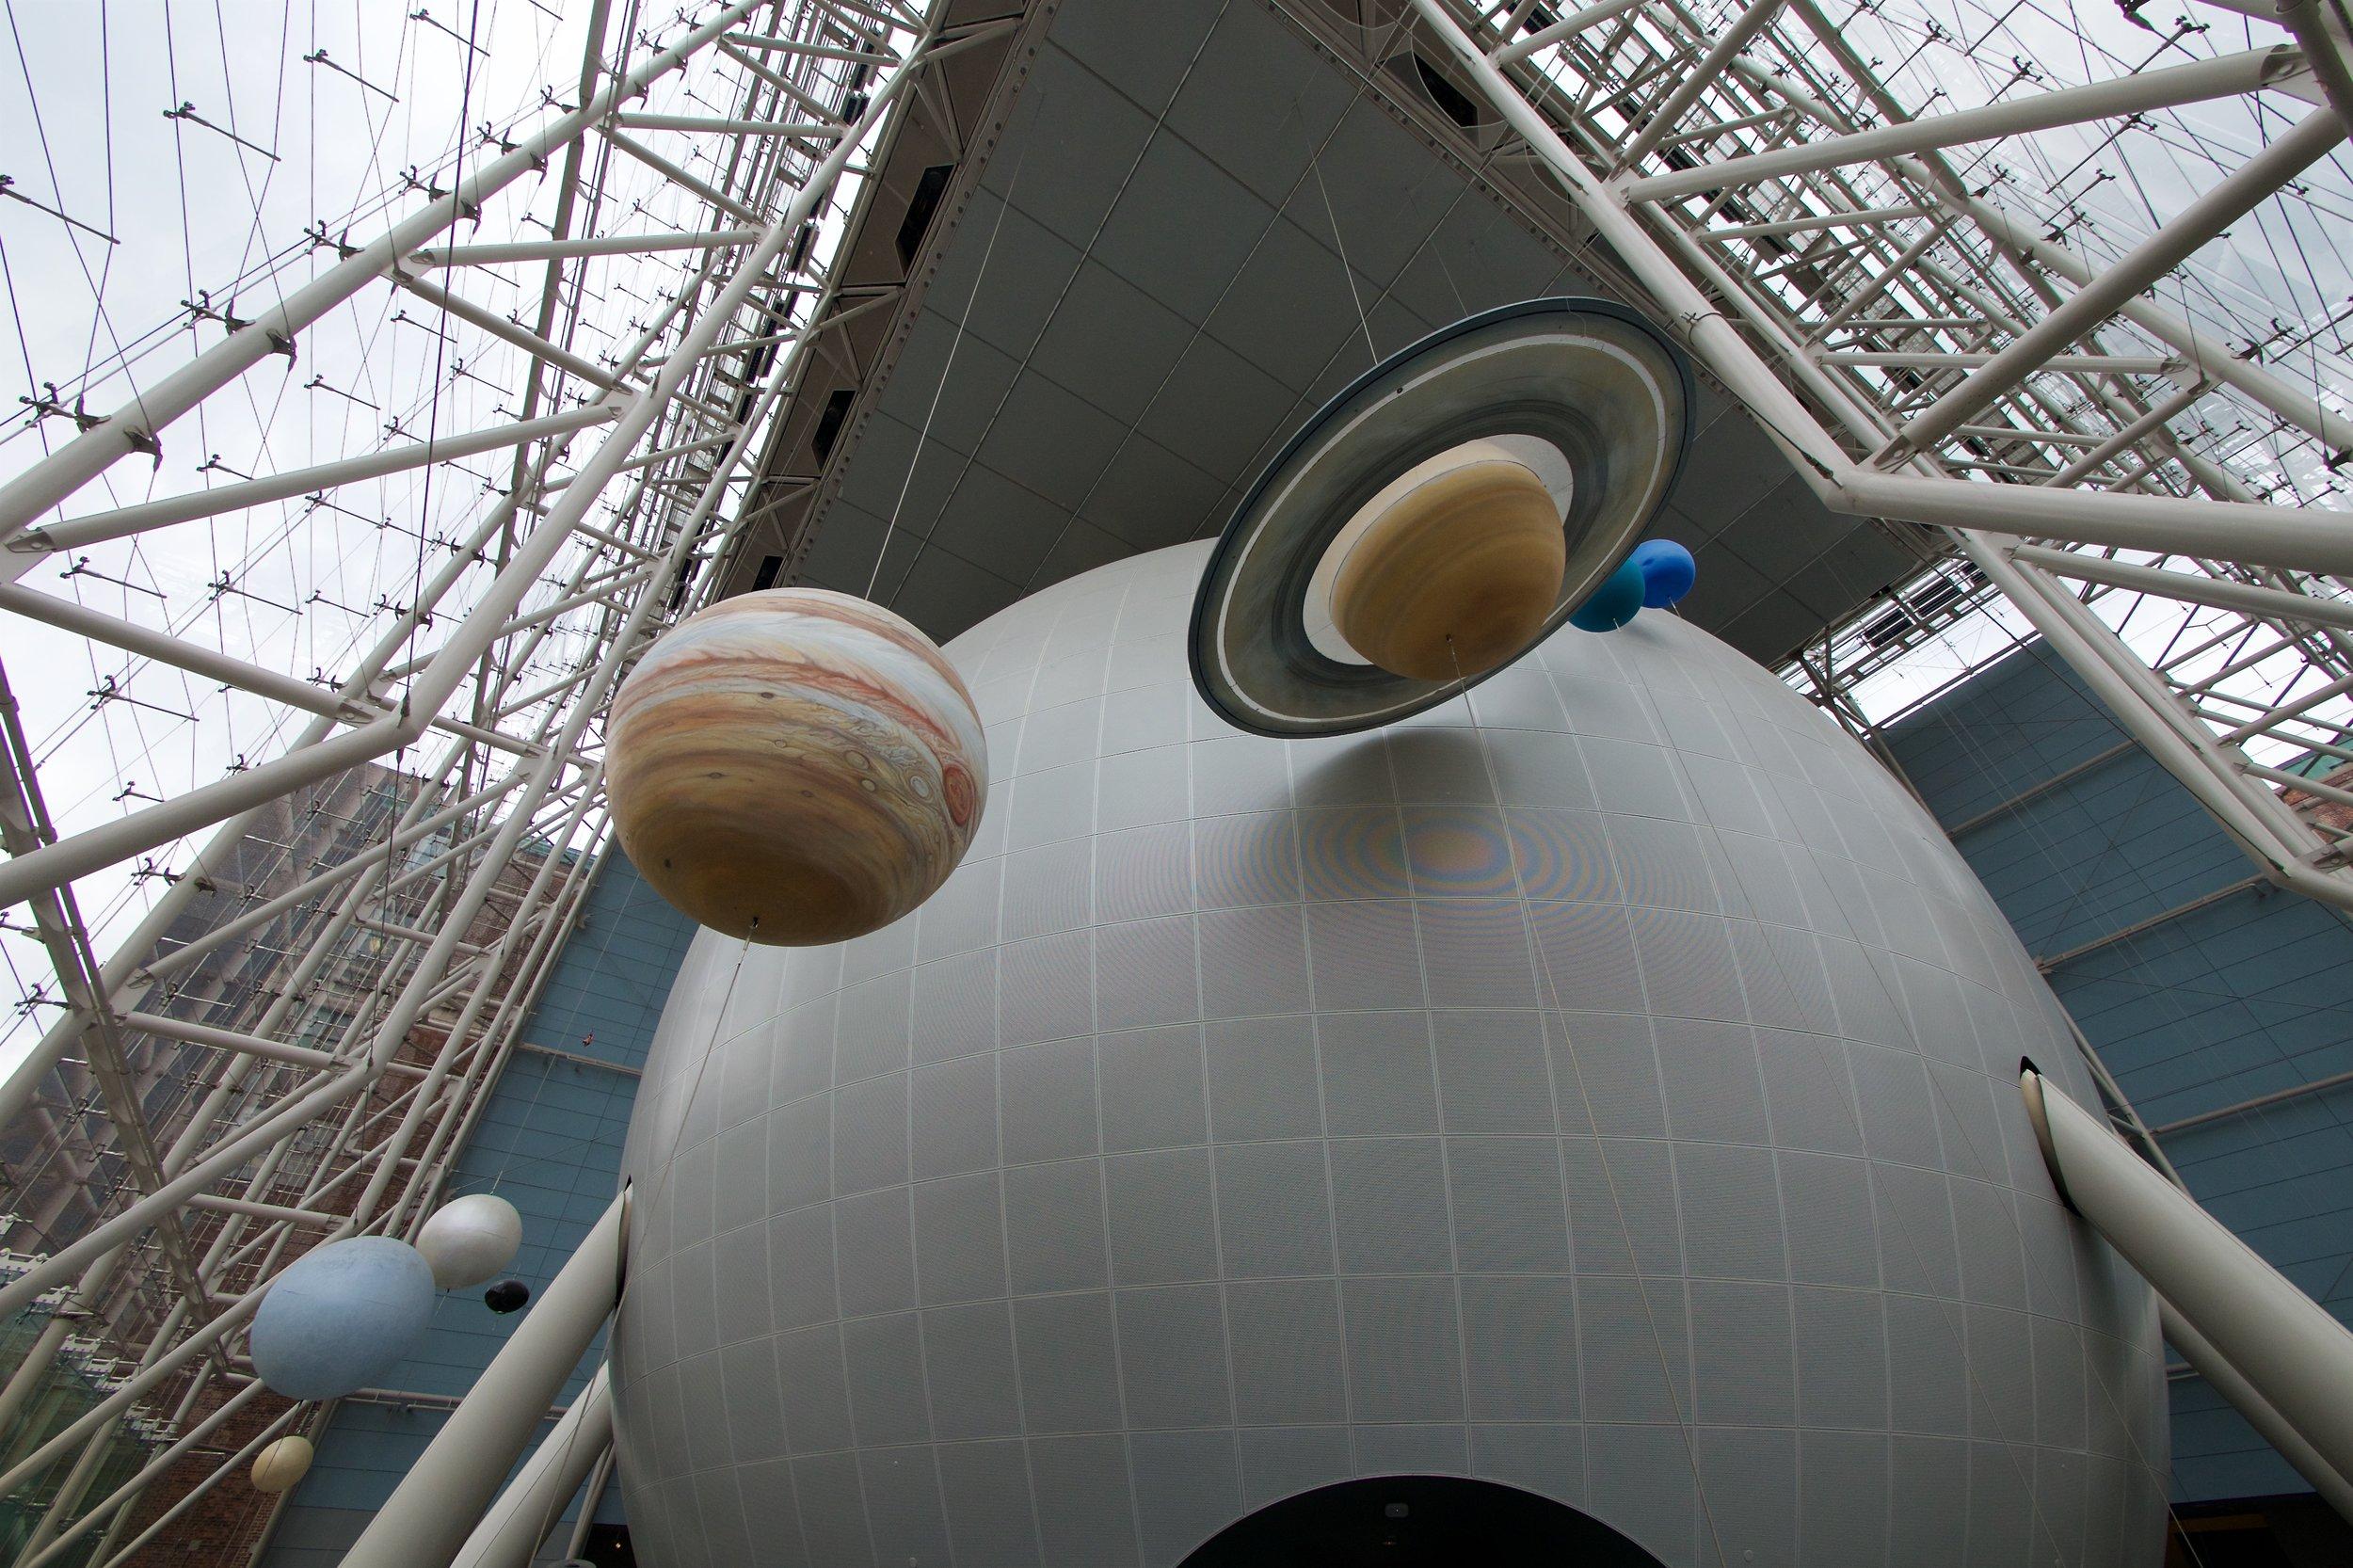 Hayden Sphere and planets